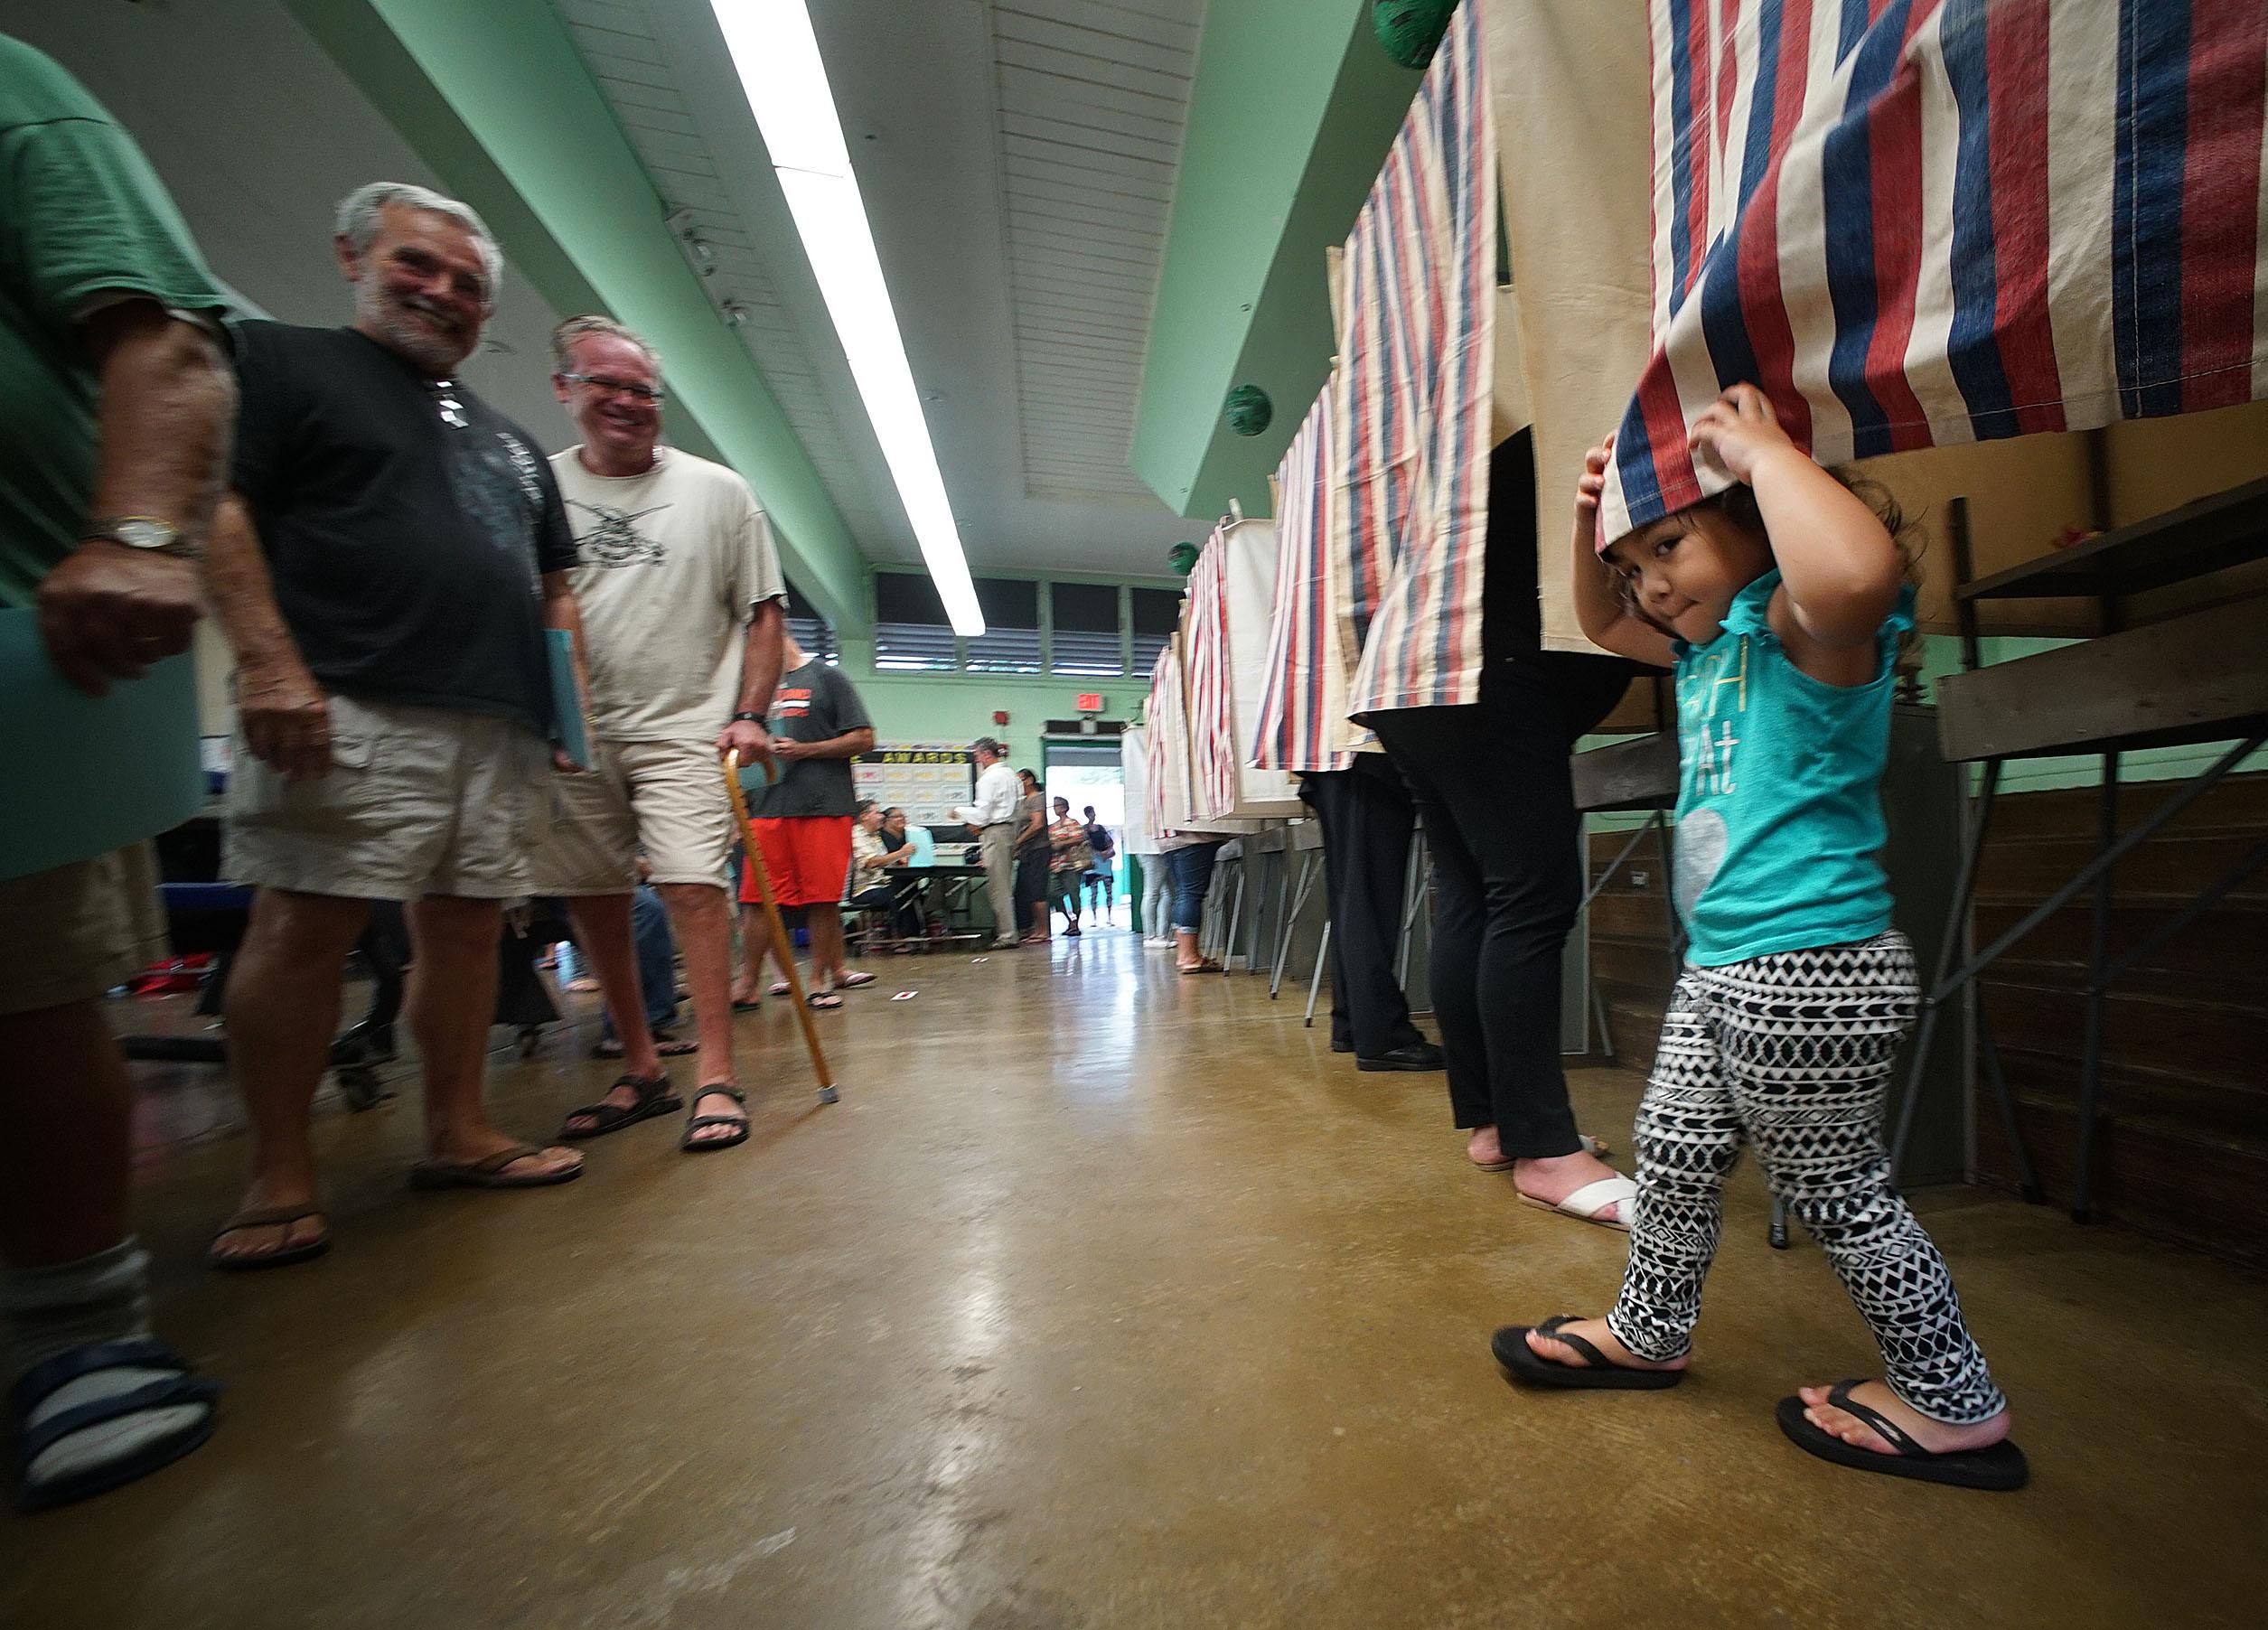 <p>Ireland Tuiono, 2, enjoyed a polling booth whilemother Kerrianne Tuiono cast her ballot Hauula Elementary. — Cory Lum/Civil Beat</p>